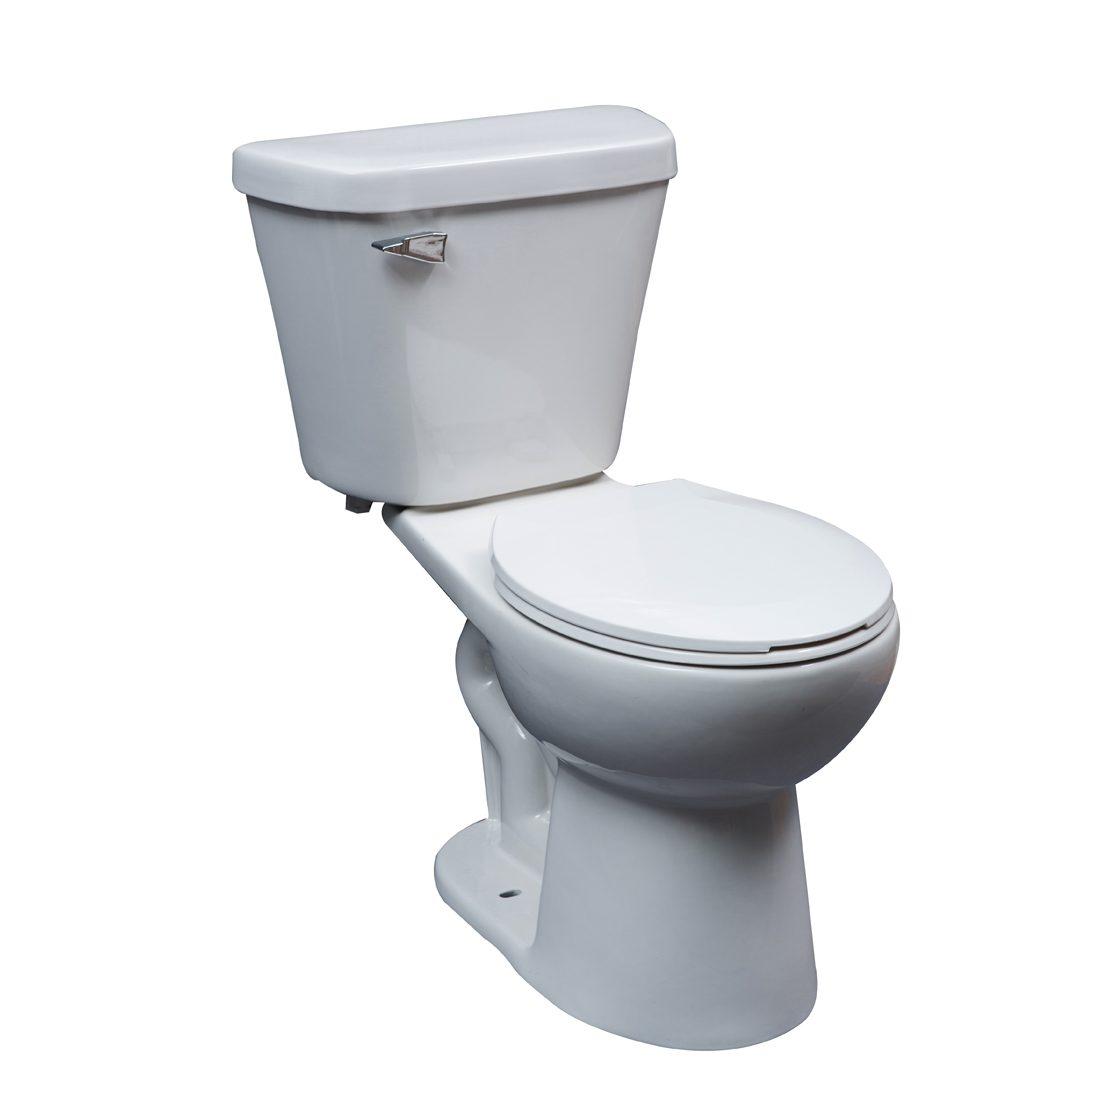 Portland Toilet 16.5inch 4.8L White Front View